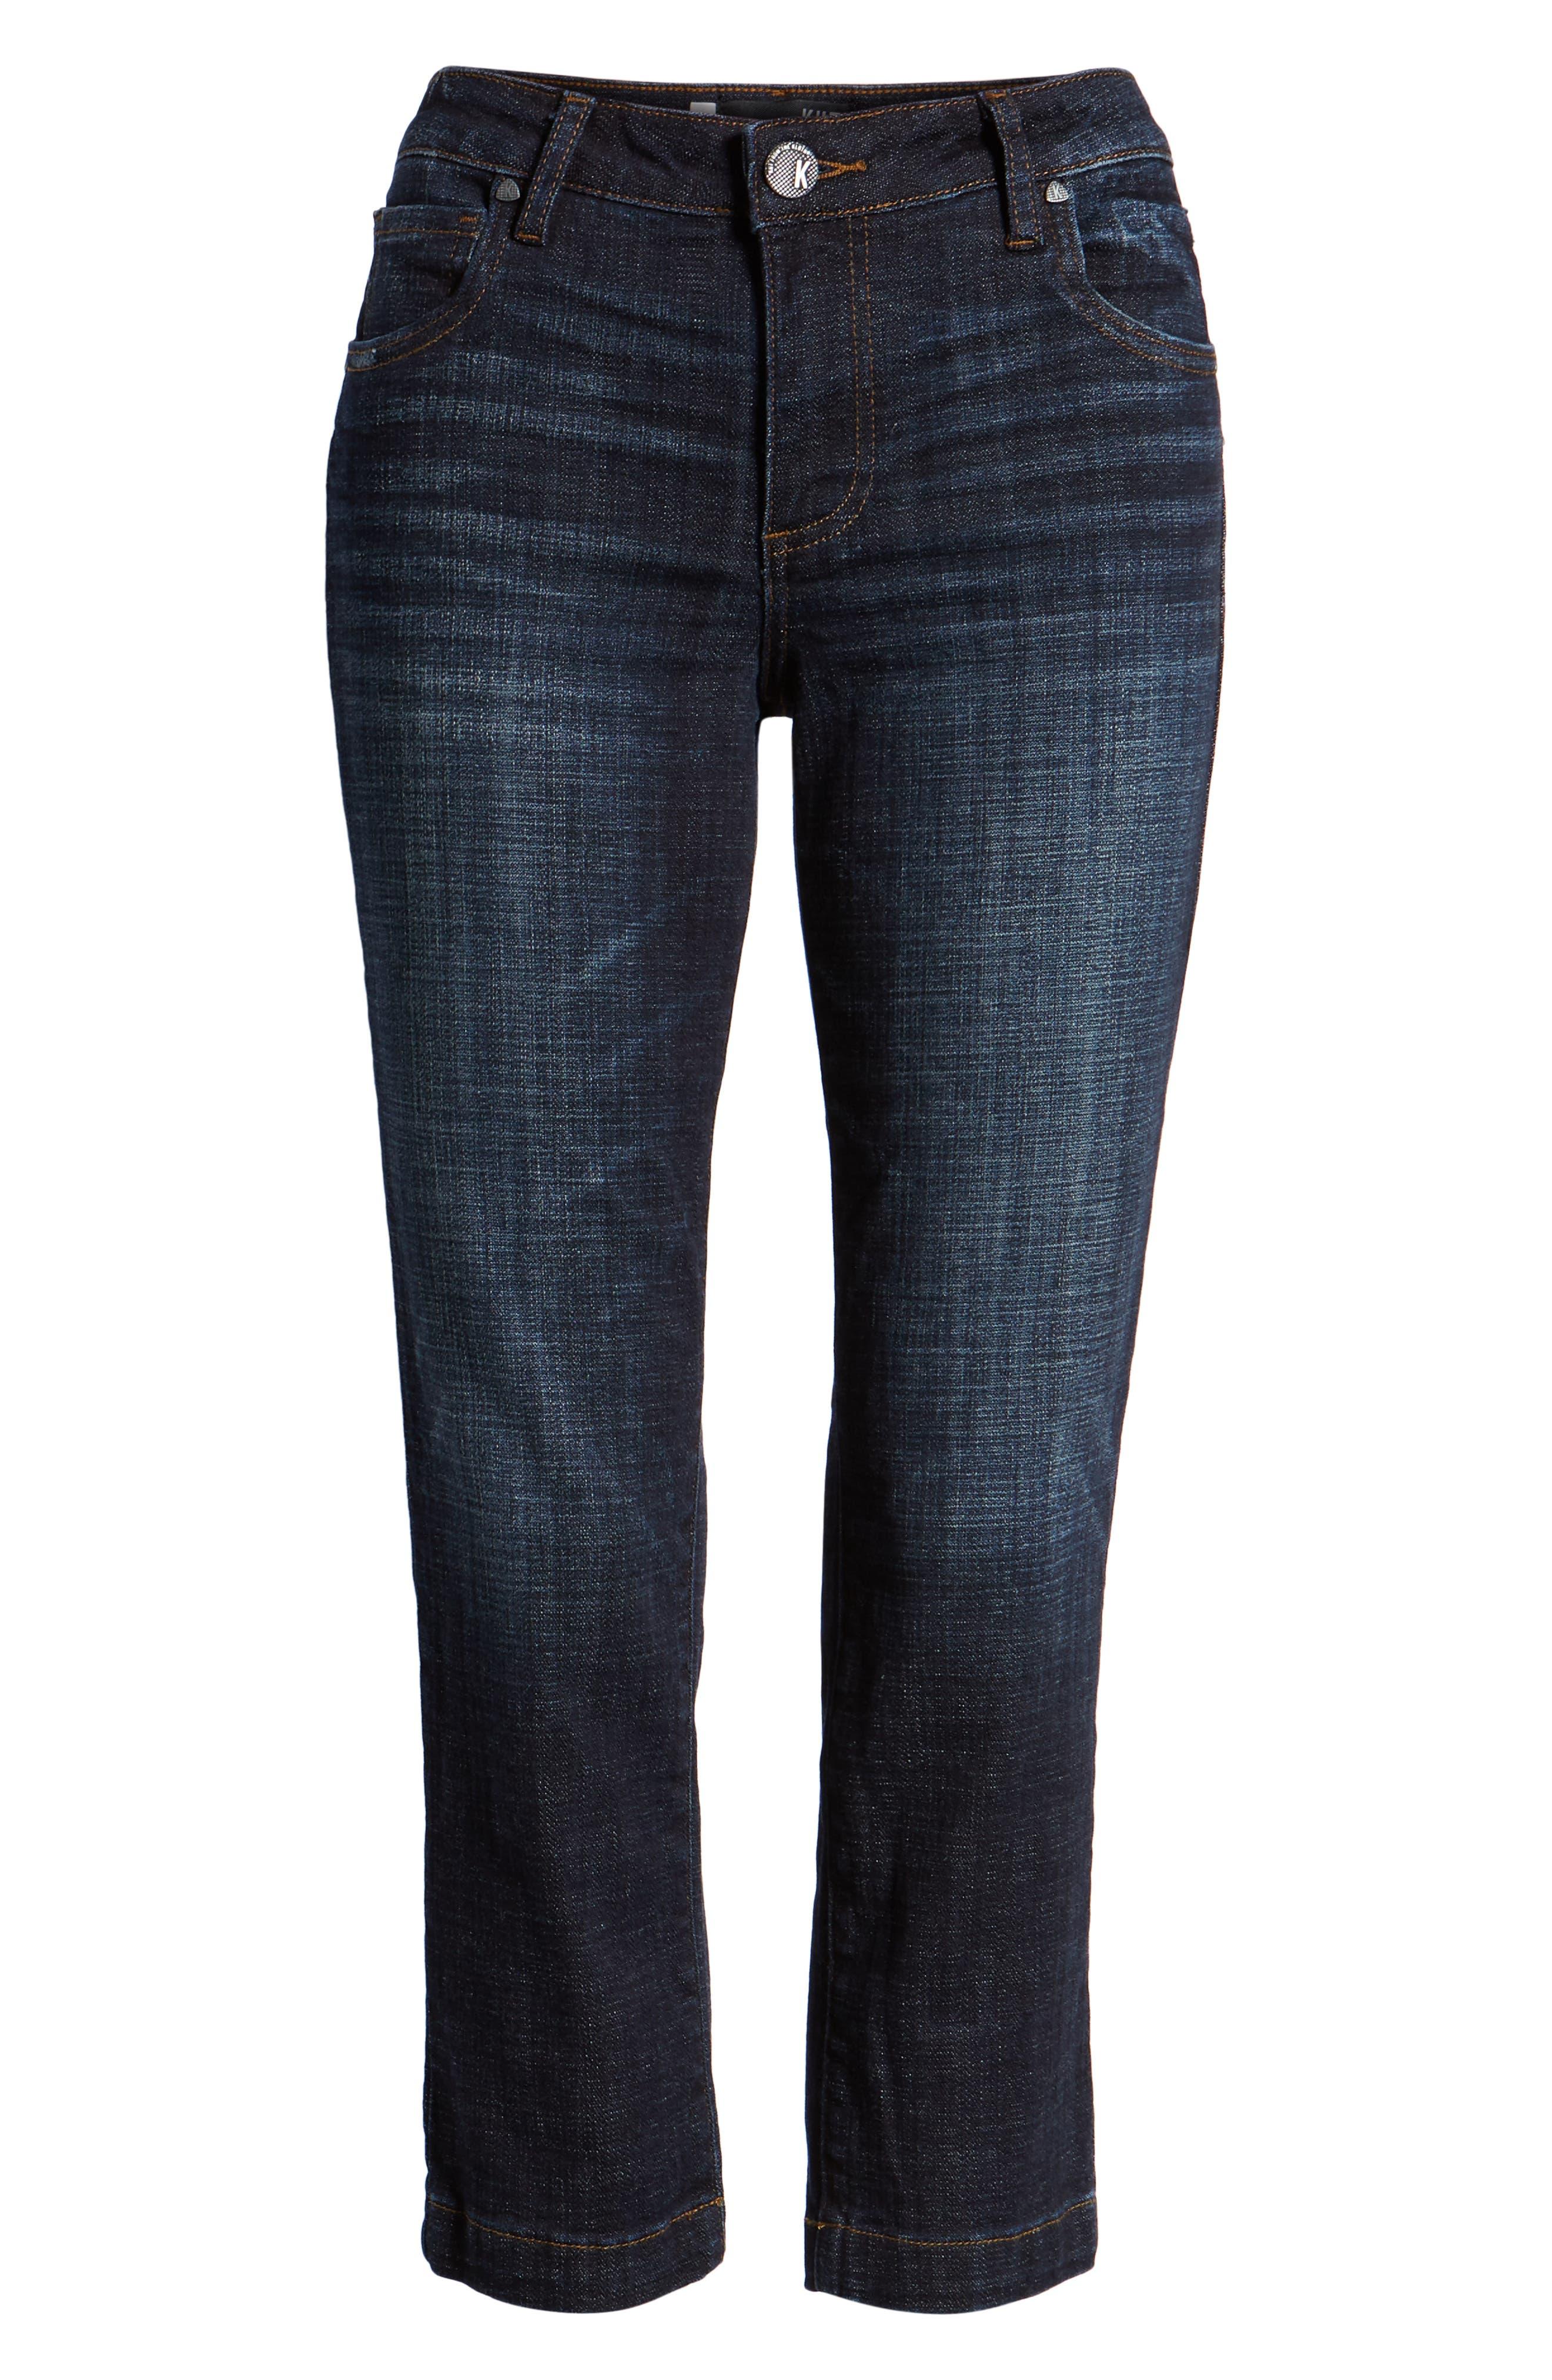 KUT from the Kloth Lauren Crop Straight Leg Jeans,                             Alternate thumbnail 7, color,                             440